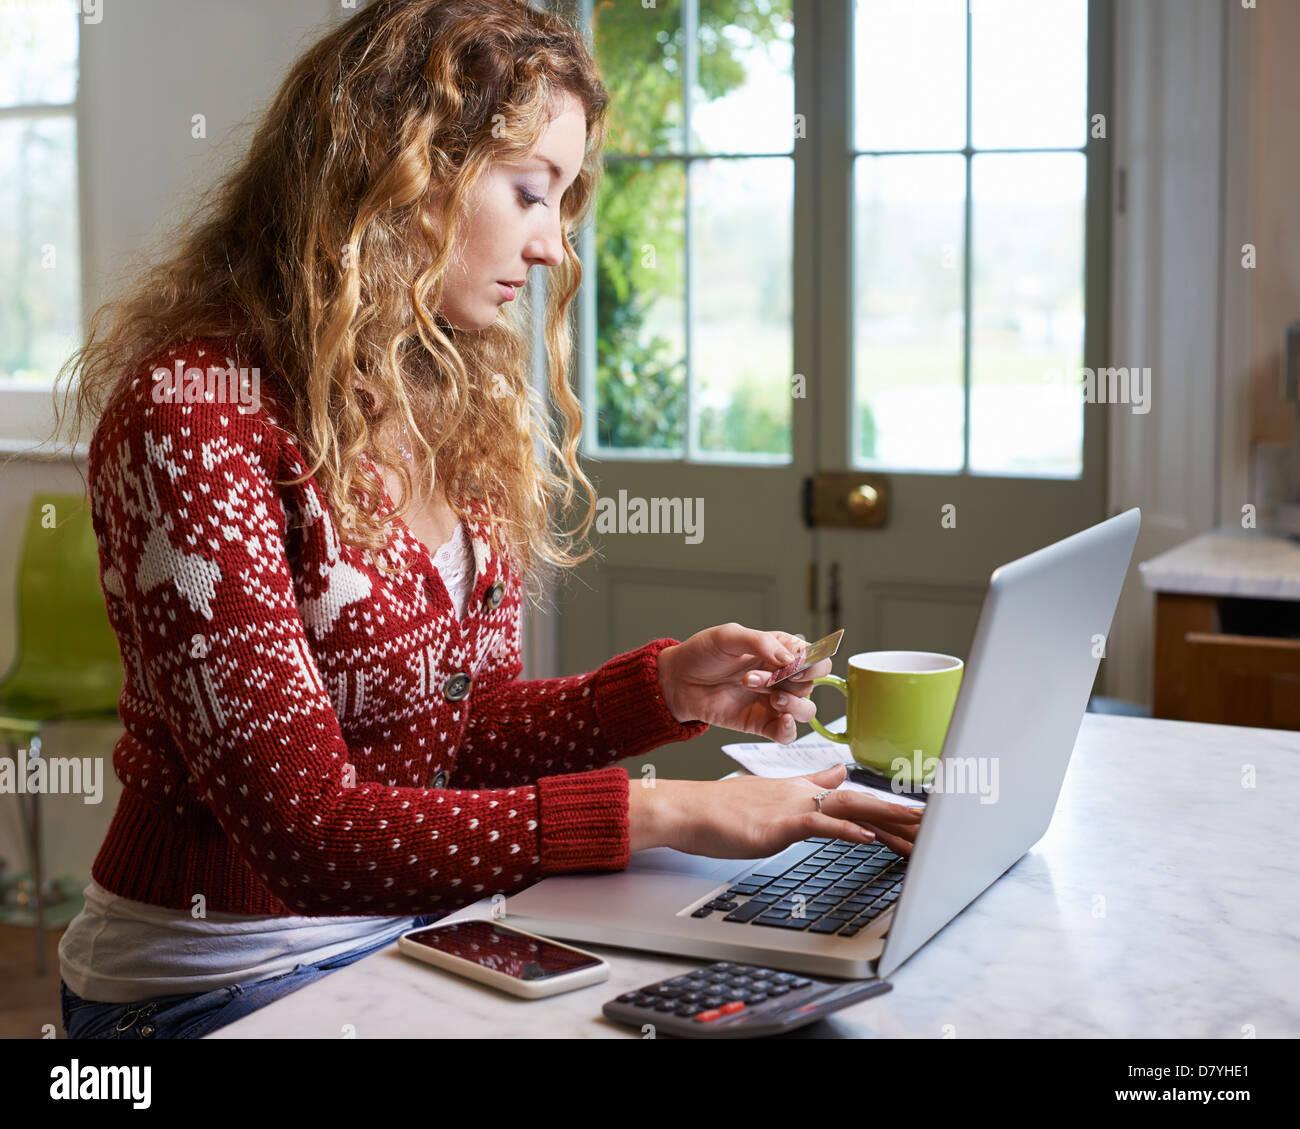 Woman shopping on laptop - Stock Image